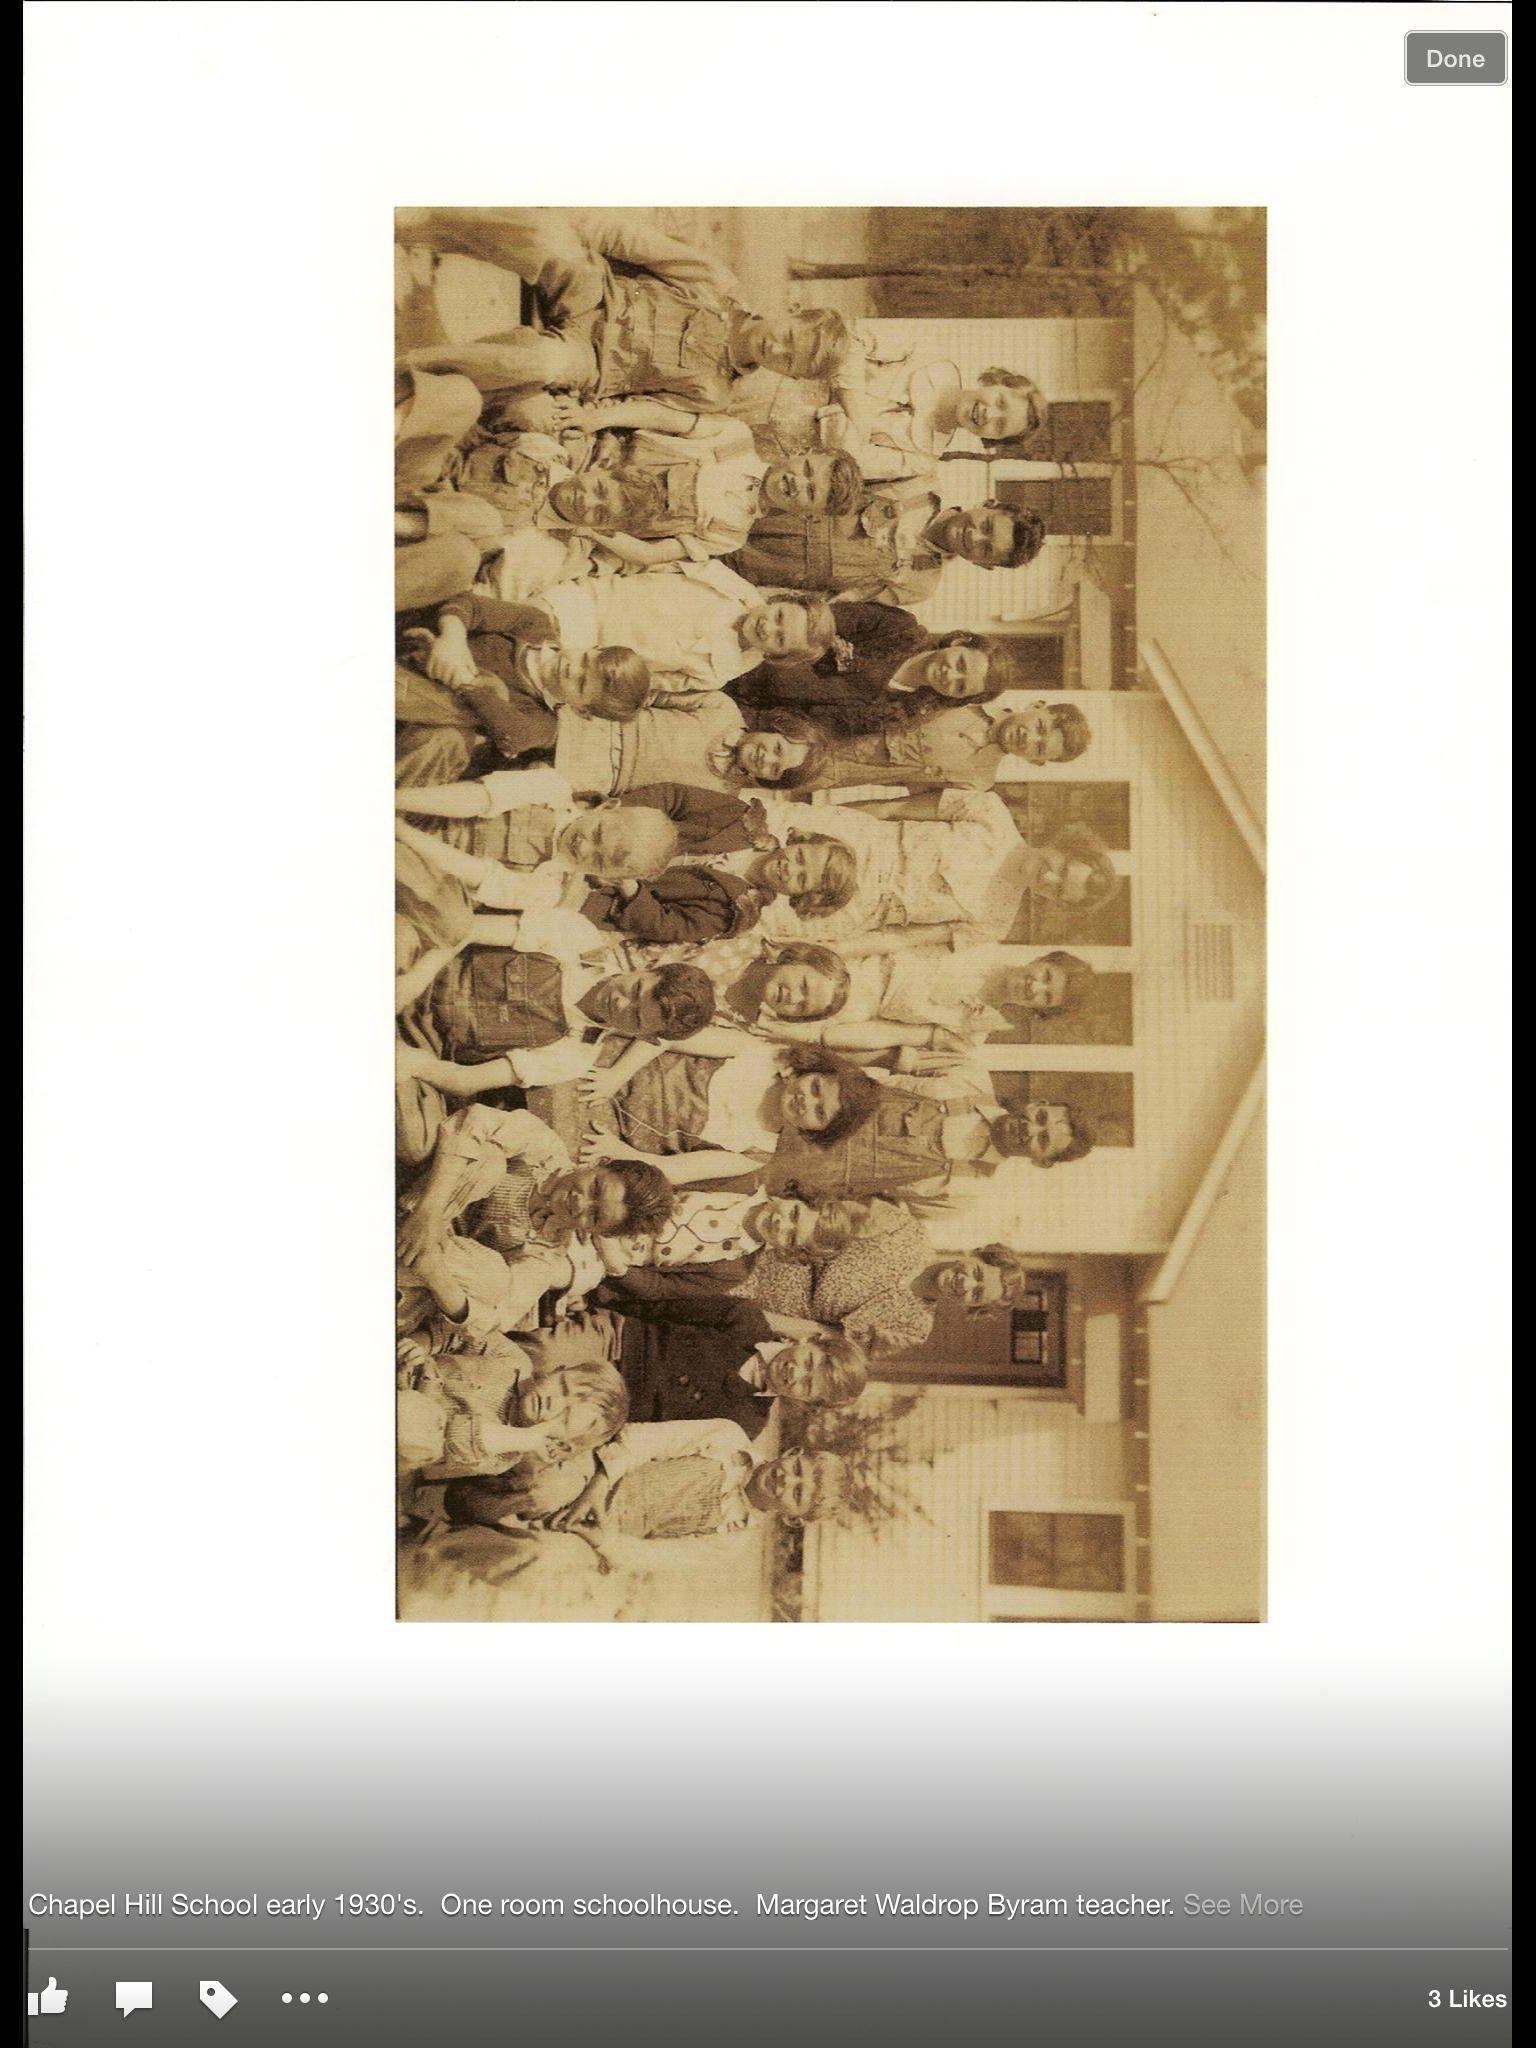 Chapel Hill School One Room Schoolhouse Early 1930s Margaret Waldrop Byram Teacher Christi Smith Baldwin Via Every Now And Douglasville Schools First Decor